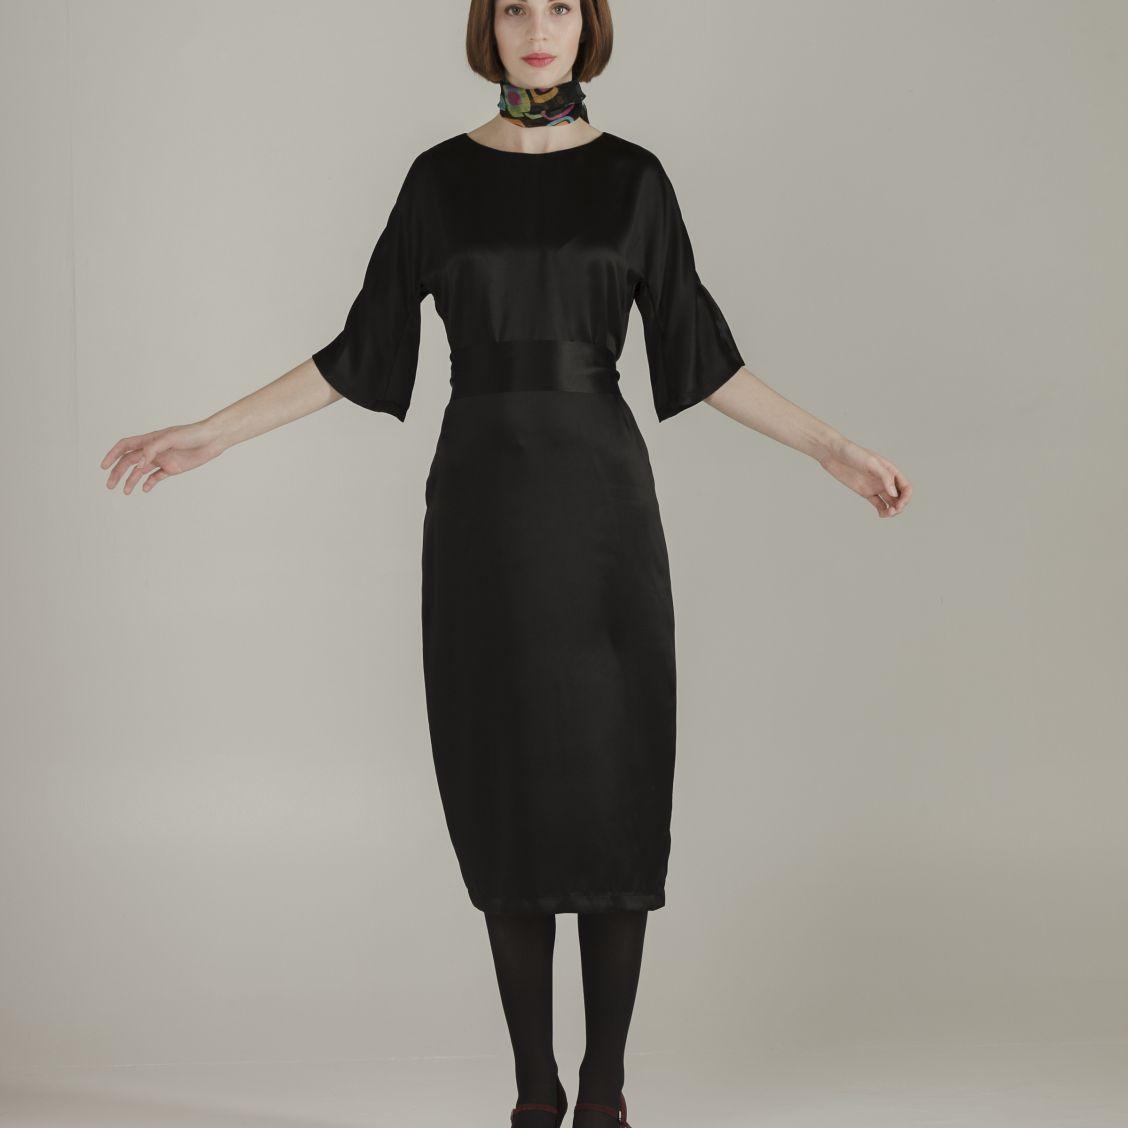 Perfect Black Dress 1413   My Style Pinboard   Pinterest ...